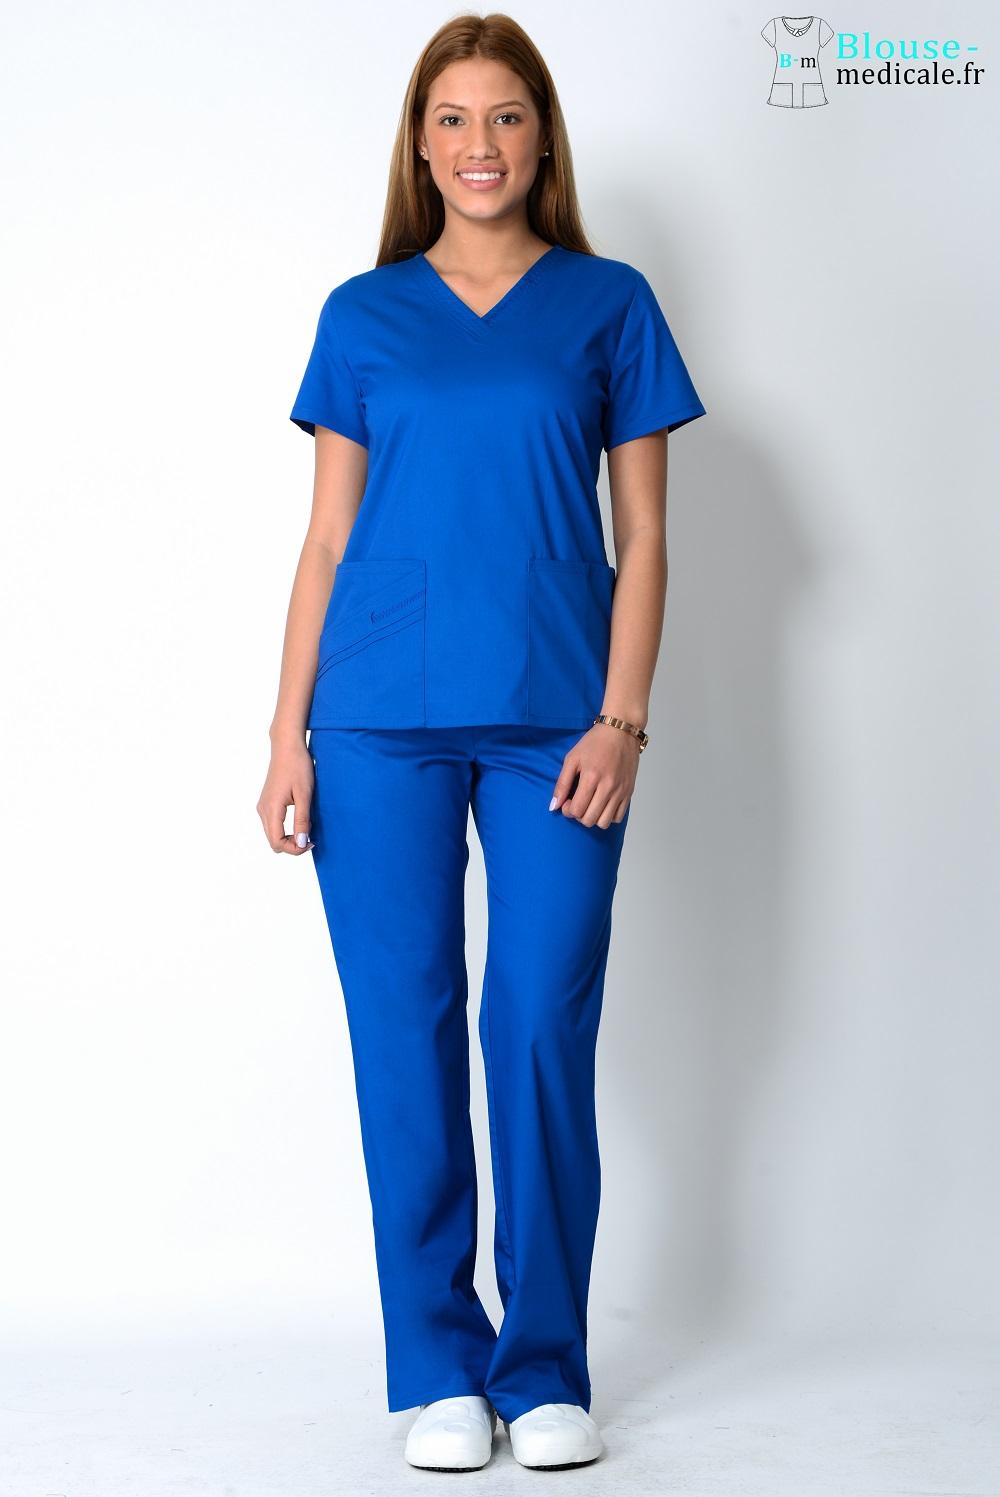 tenue médicale femme cherokee luxe tenue medicale haut de gamme femme